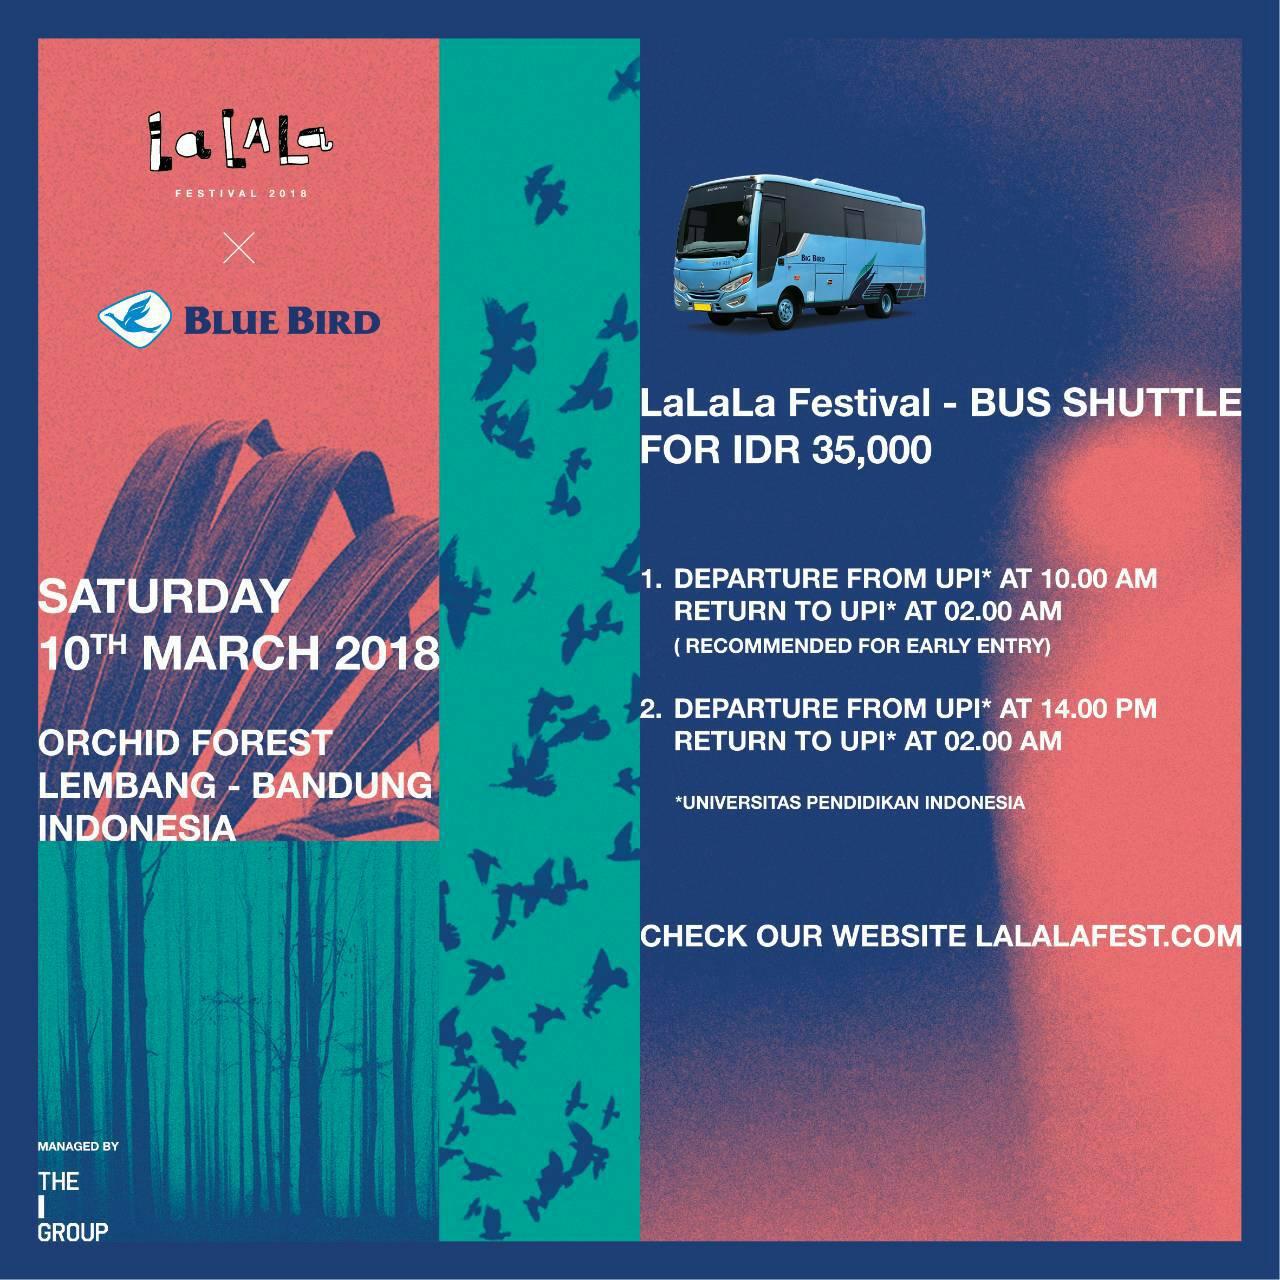 LaLaLa Festival Shuttle (1)